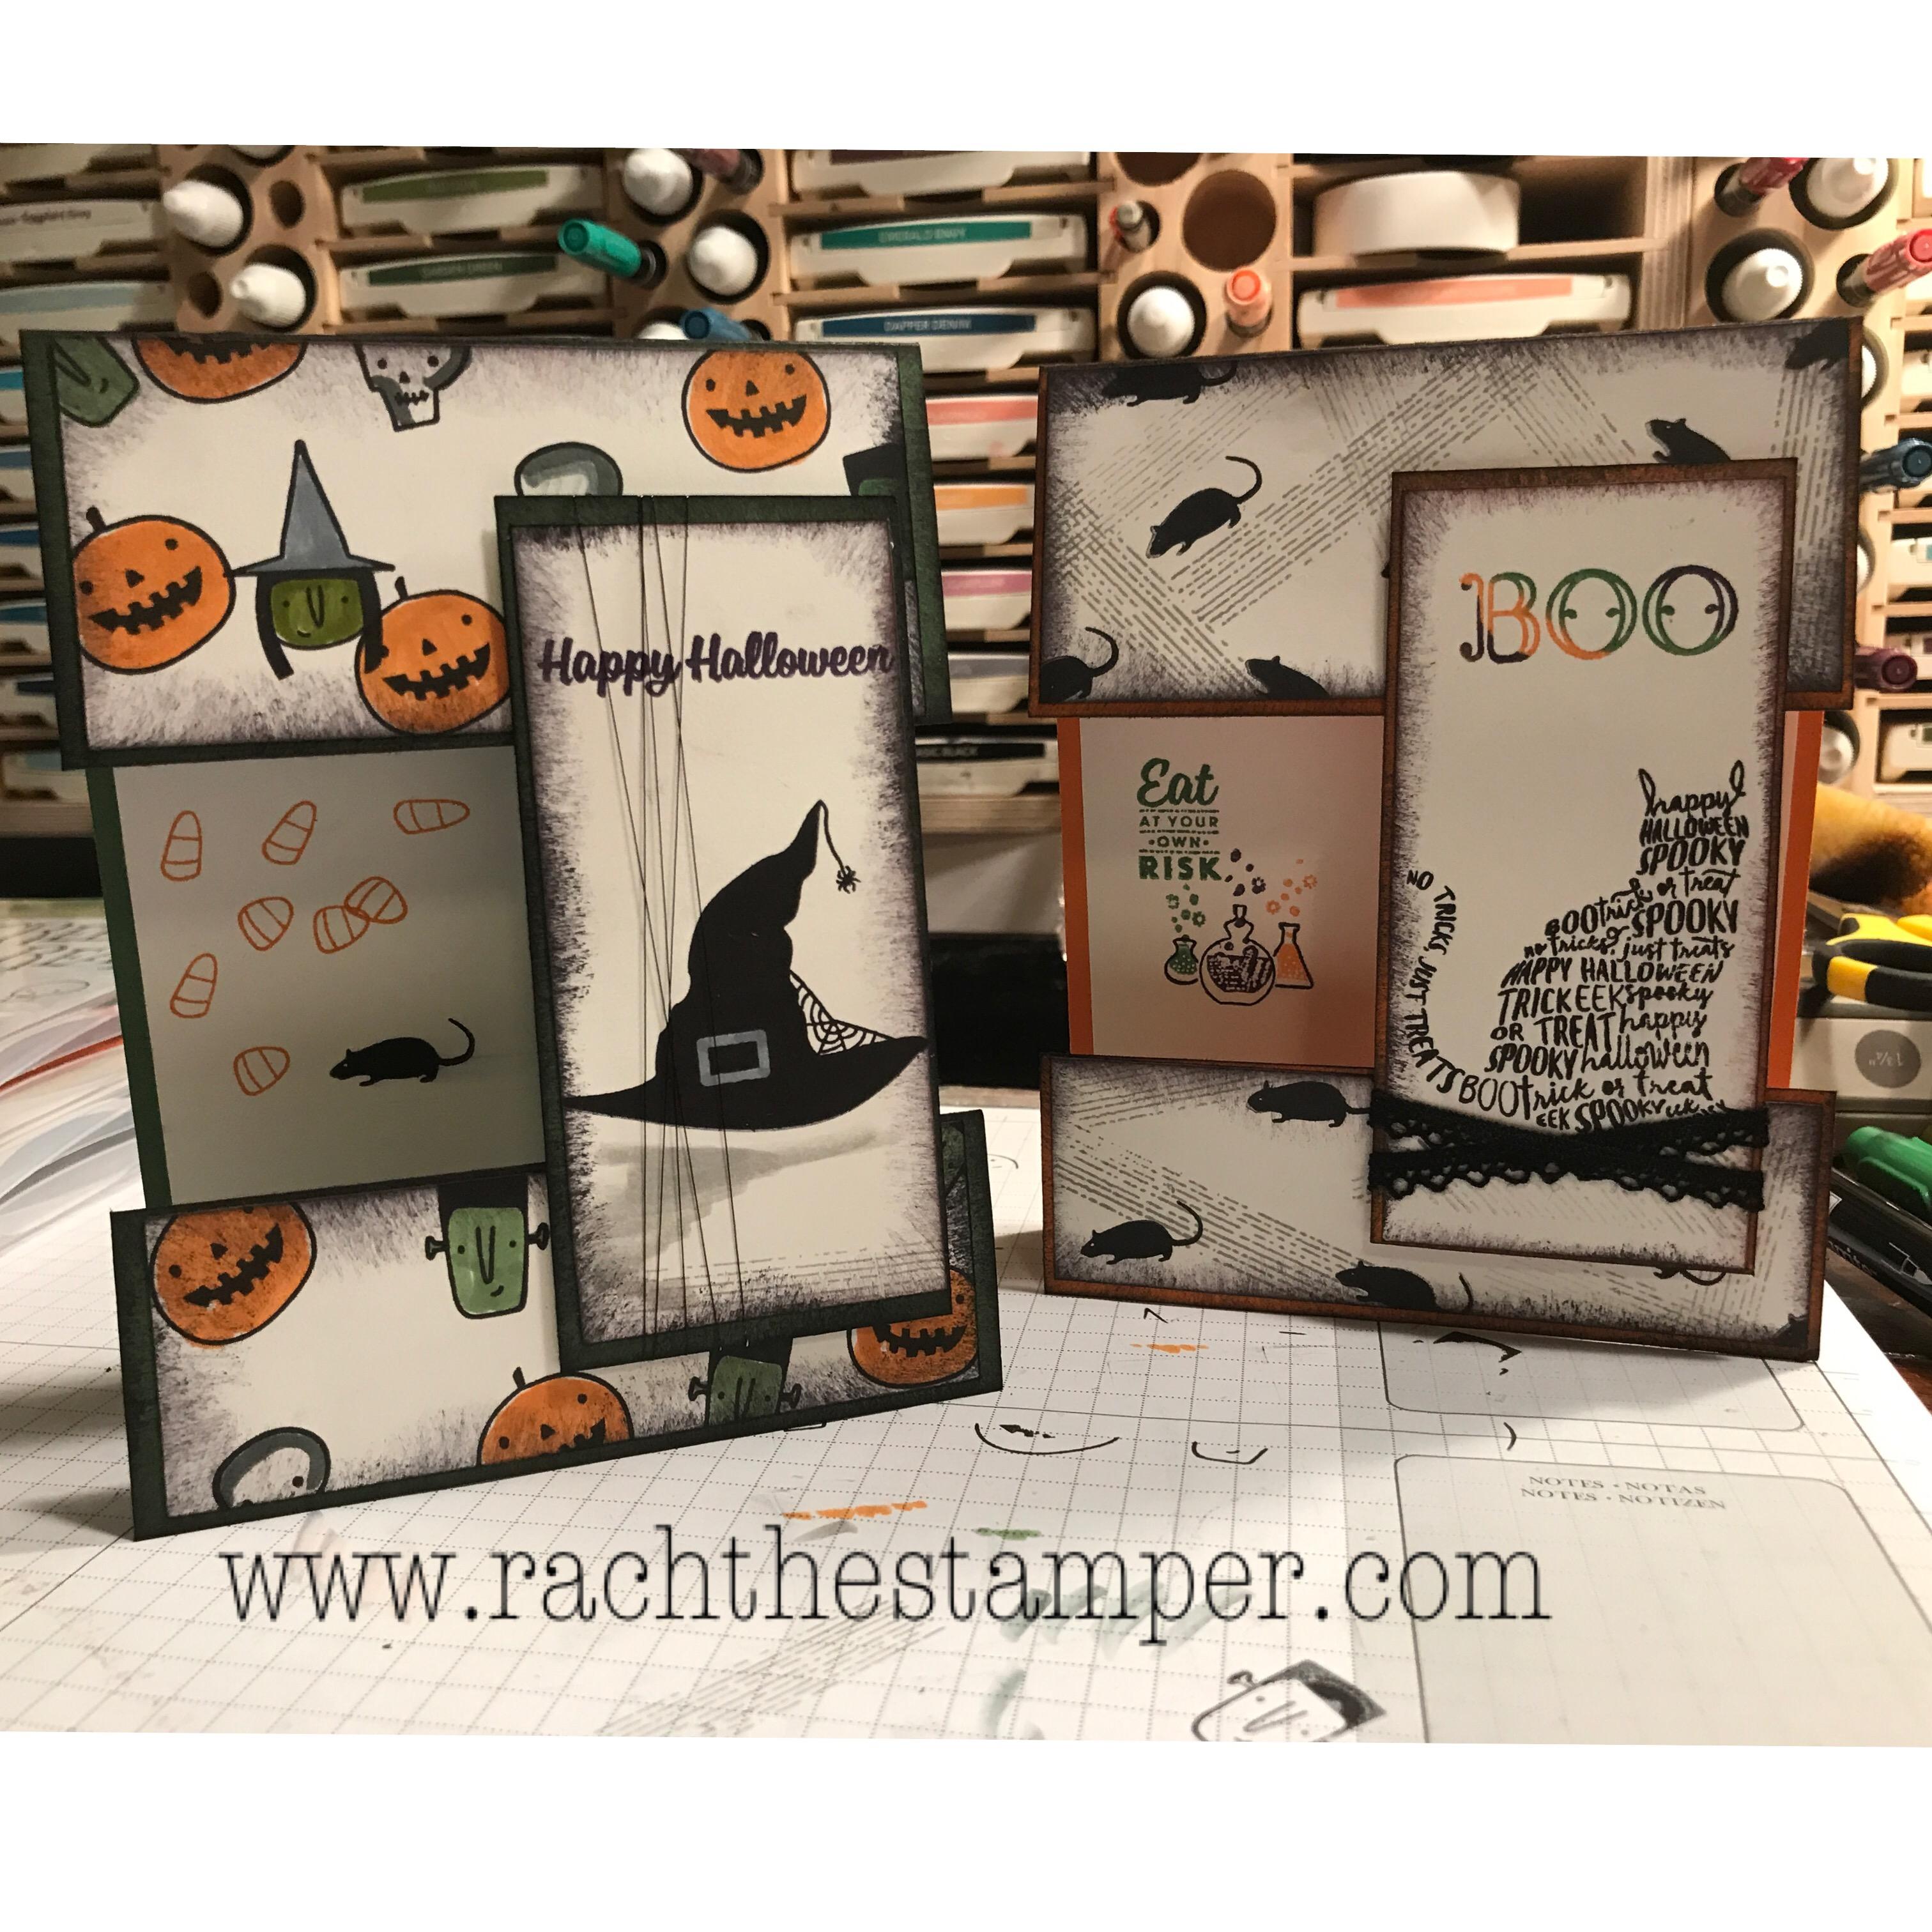 Stampin Up Halloween Card Ideas 2020 Peek Through Halloween card,Stampin' Up! • RachTheStamper